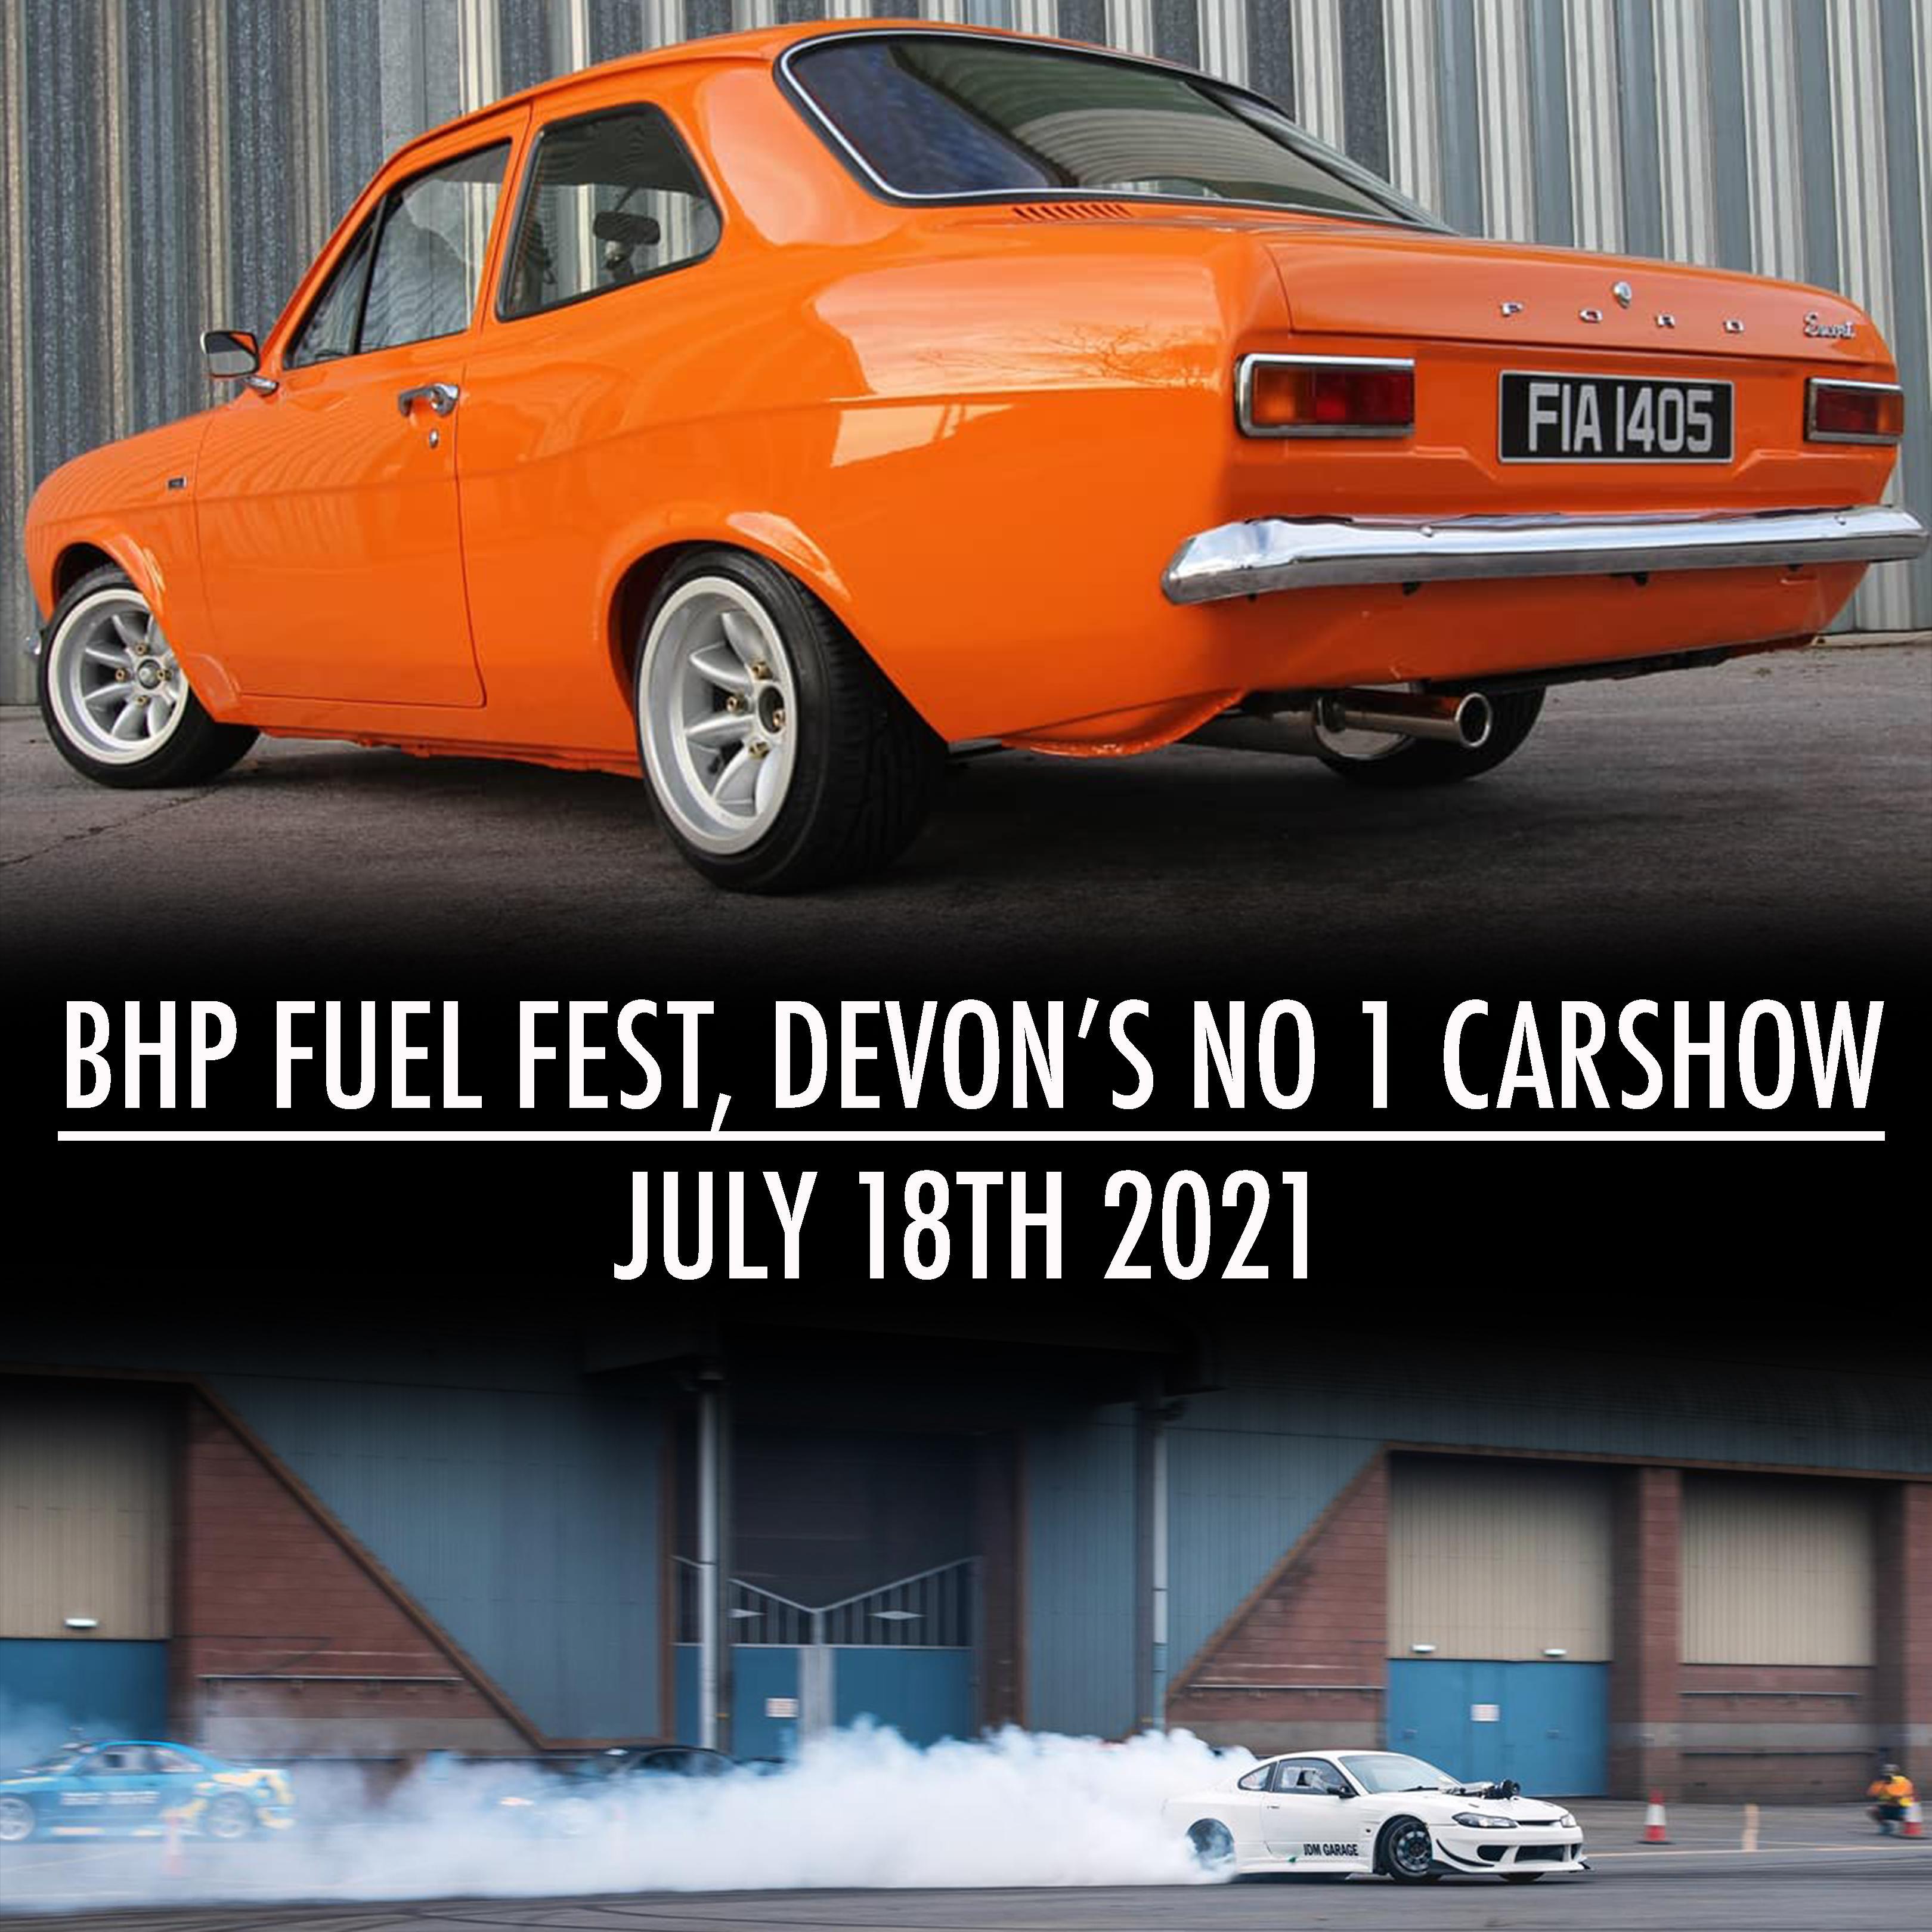 BHP Fuel Fest, The Devon